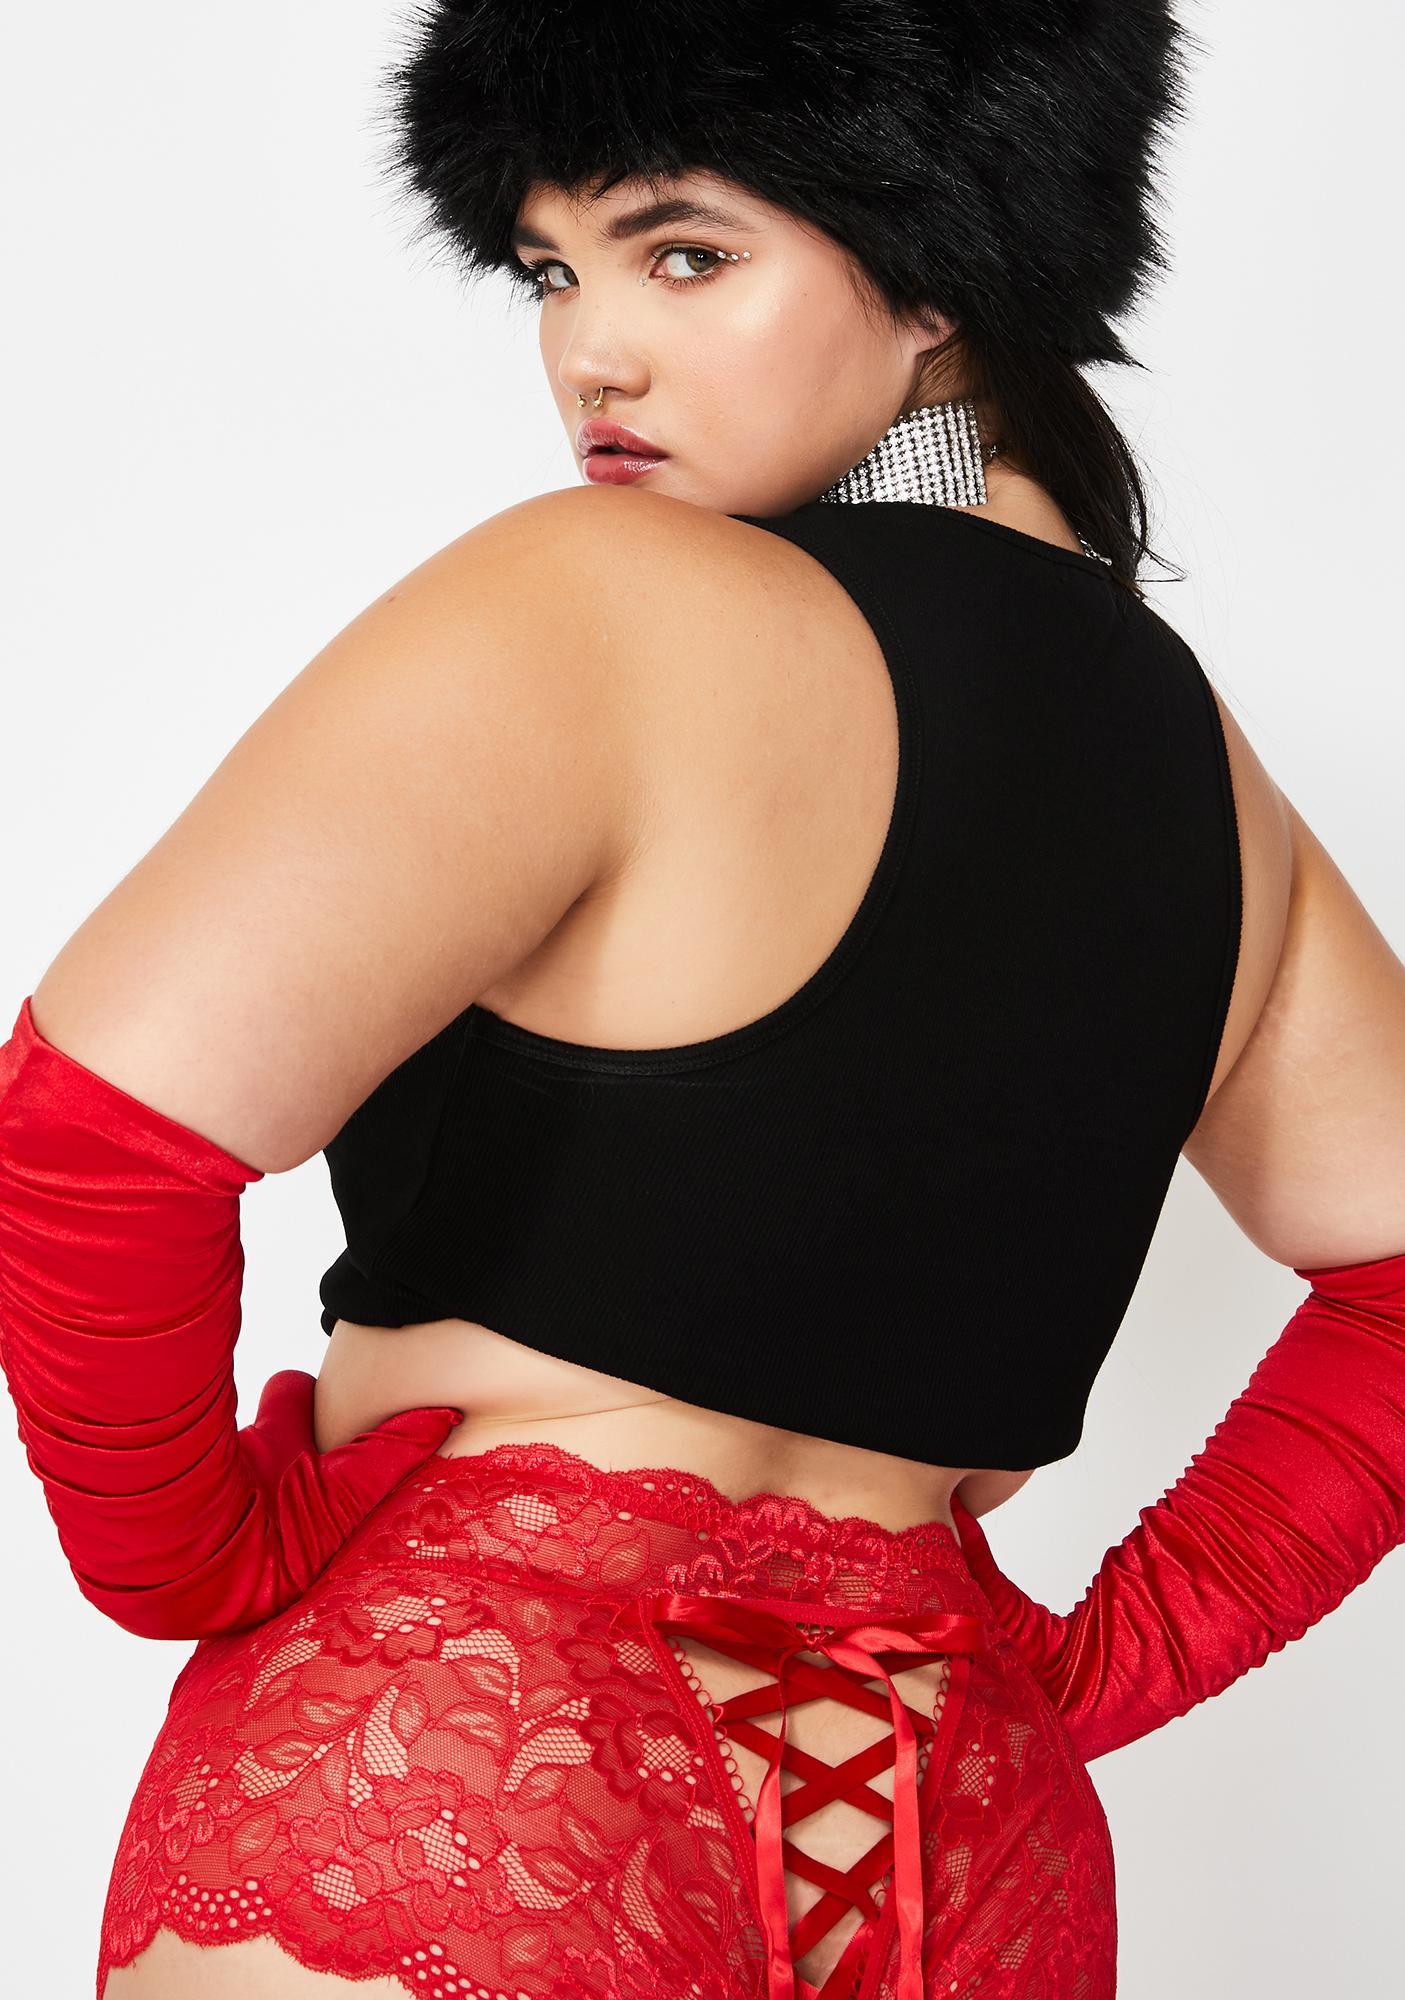 Mz Ho Ho Ho Baby Lace Up Panties